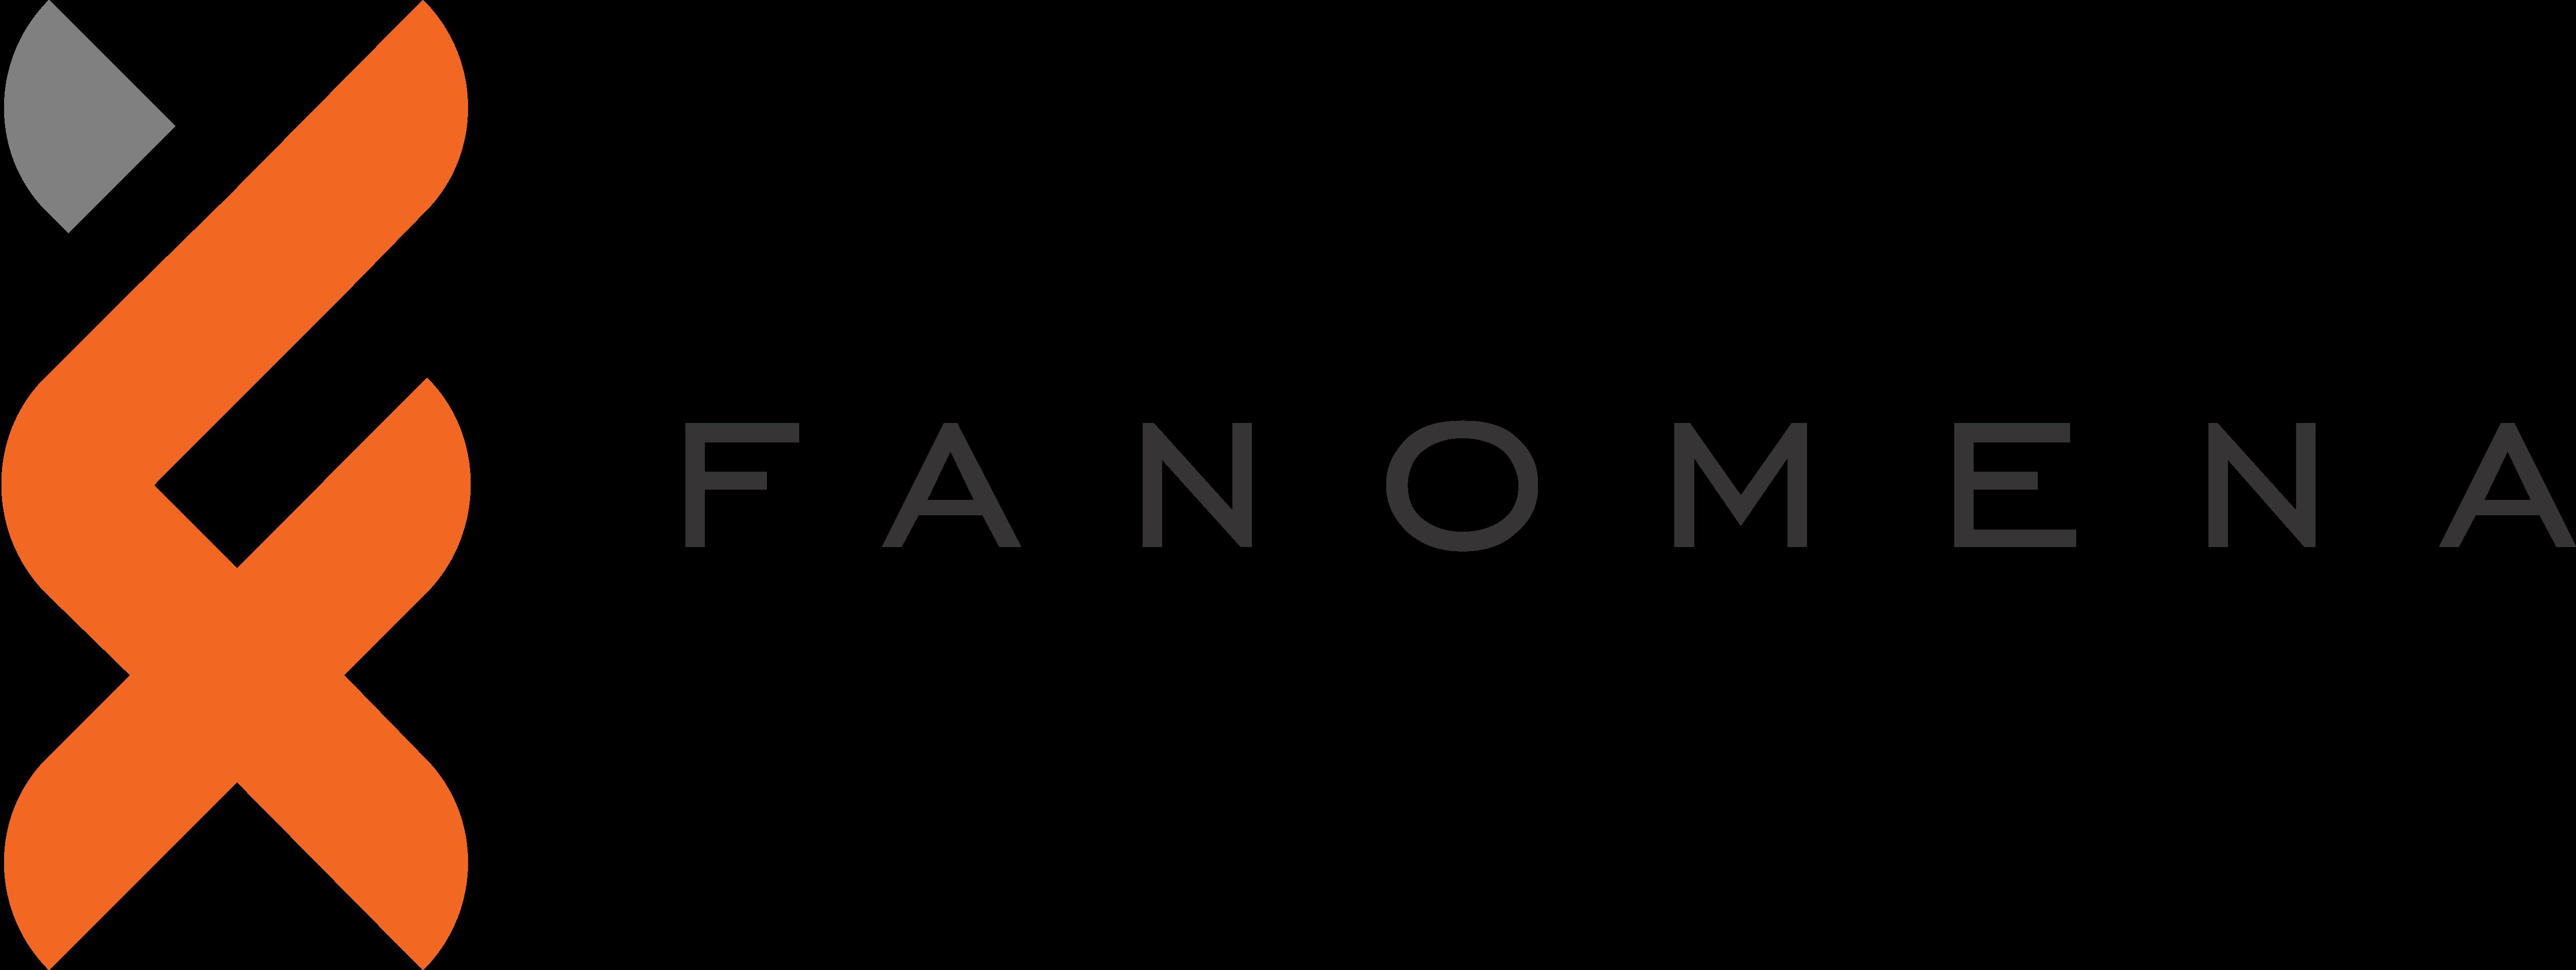 Fanomena Logo